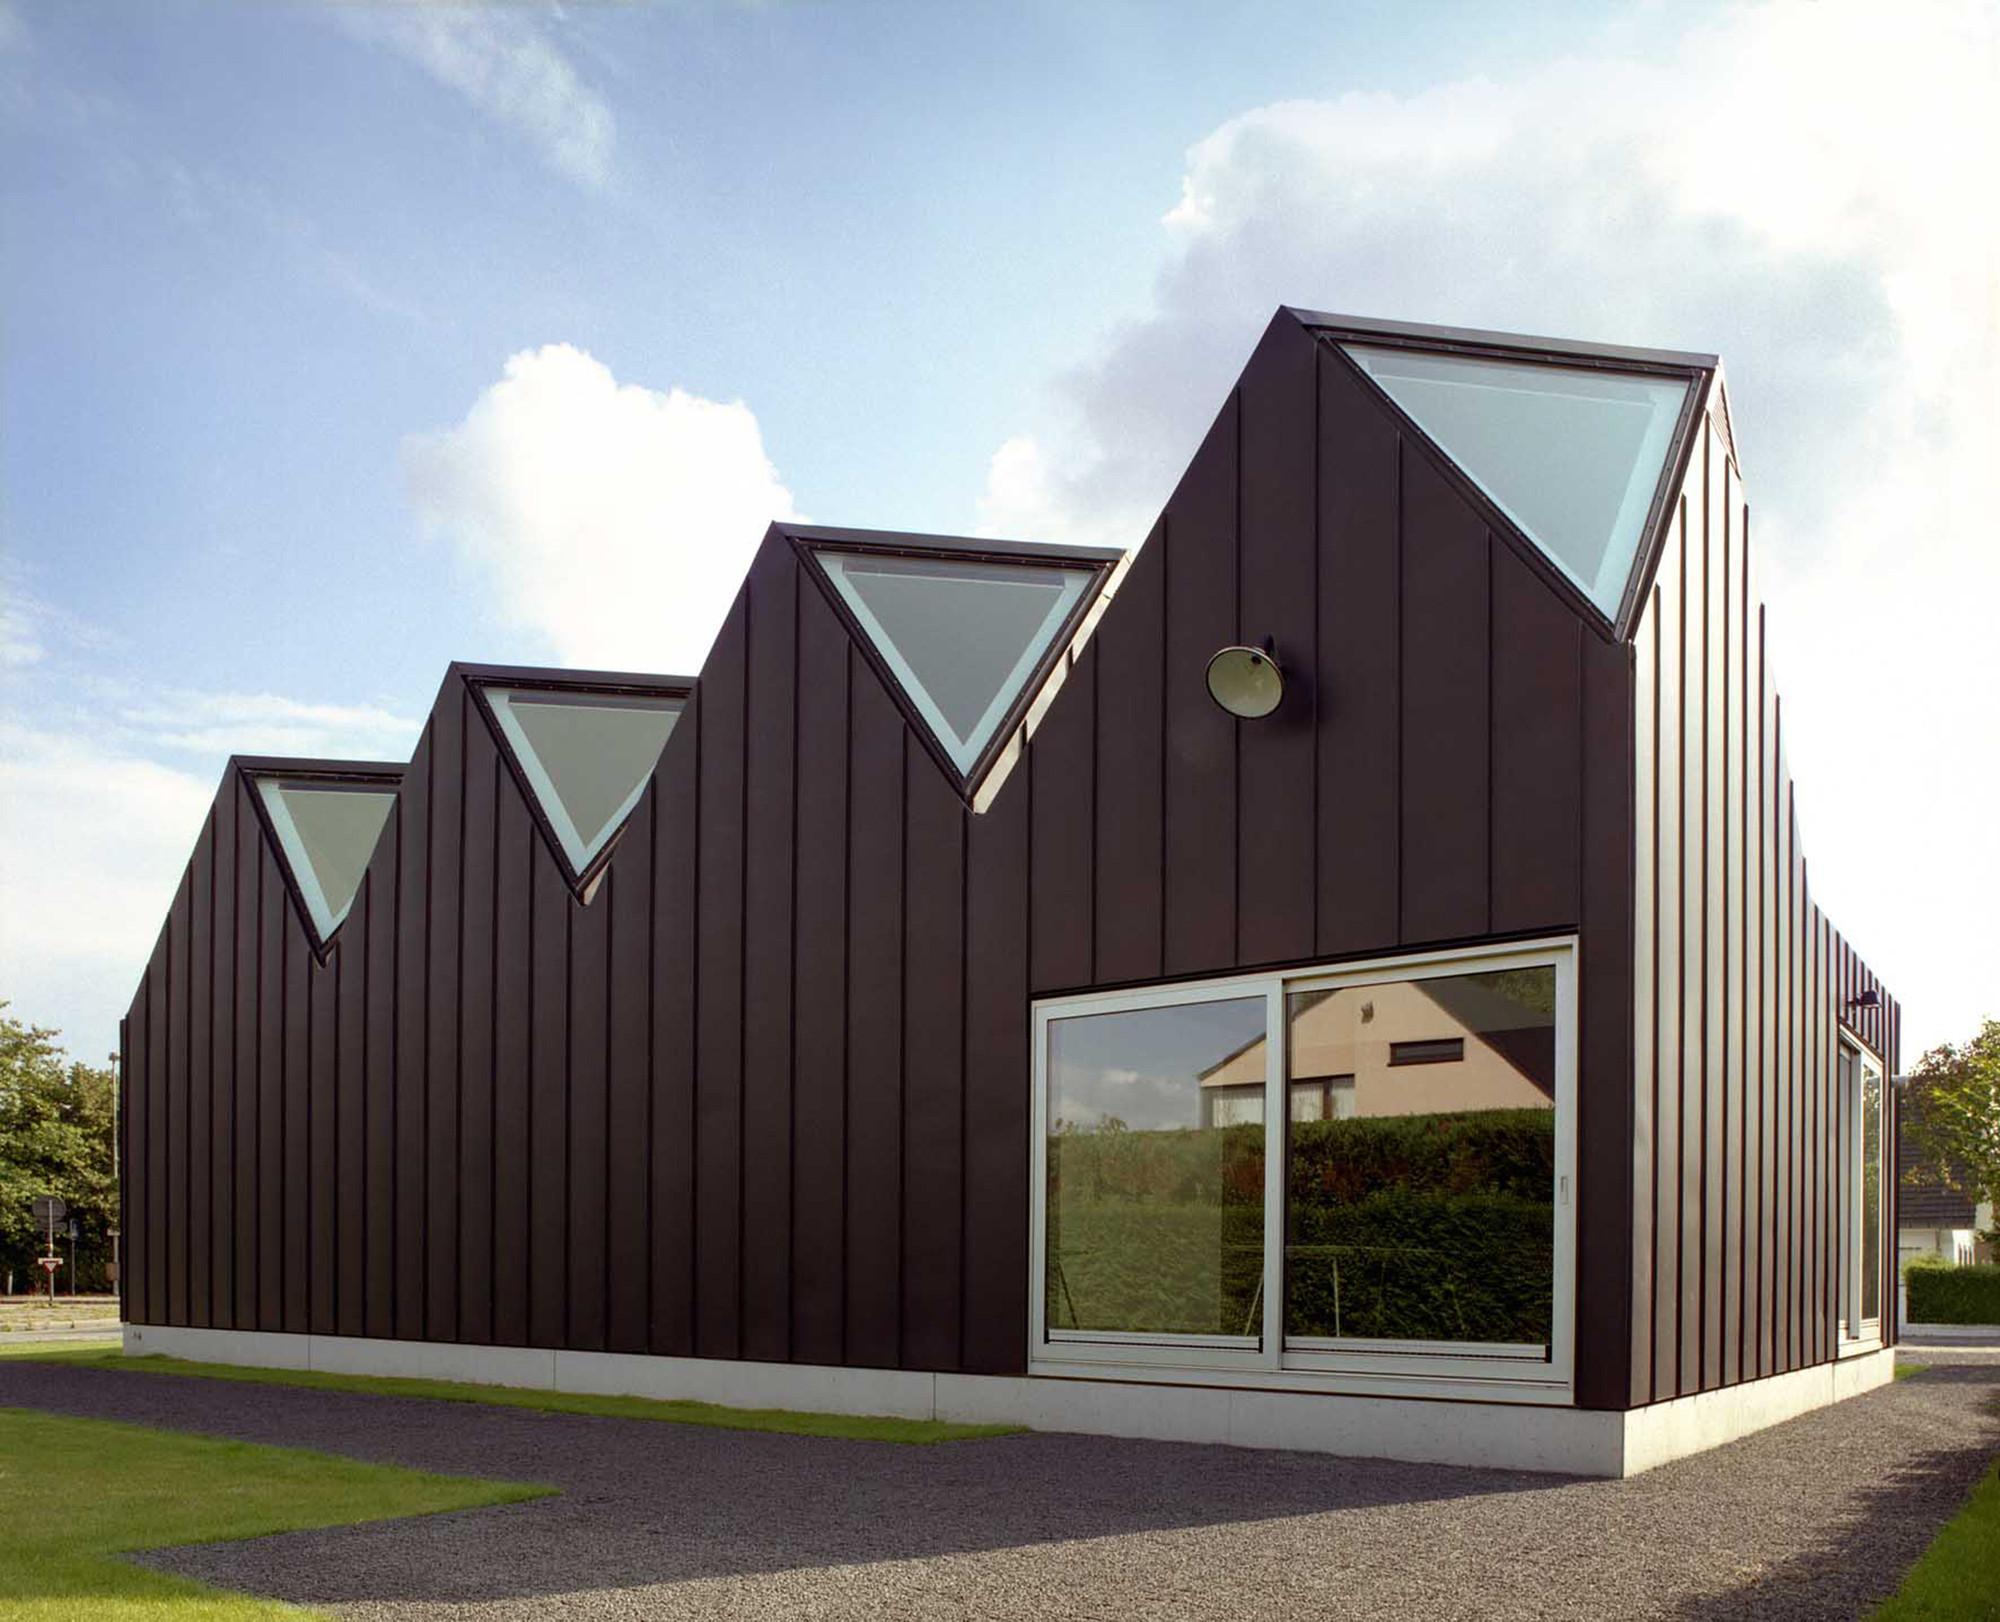 Linq nu architectuuratelier archdaily for Architecture zinc